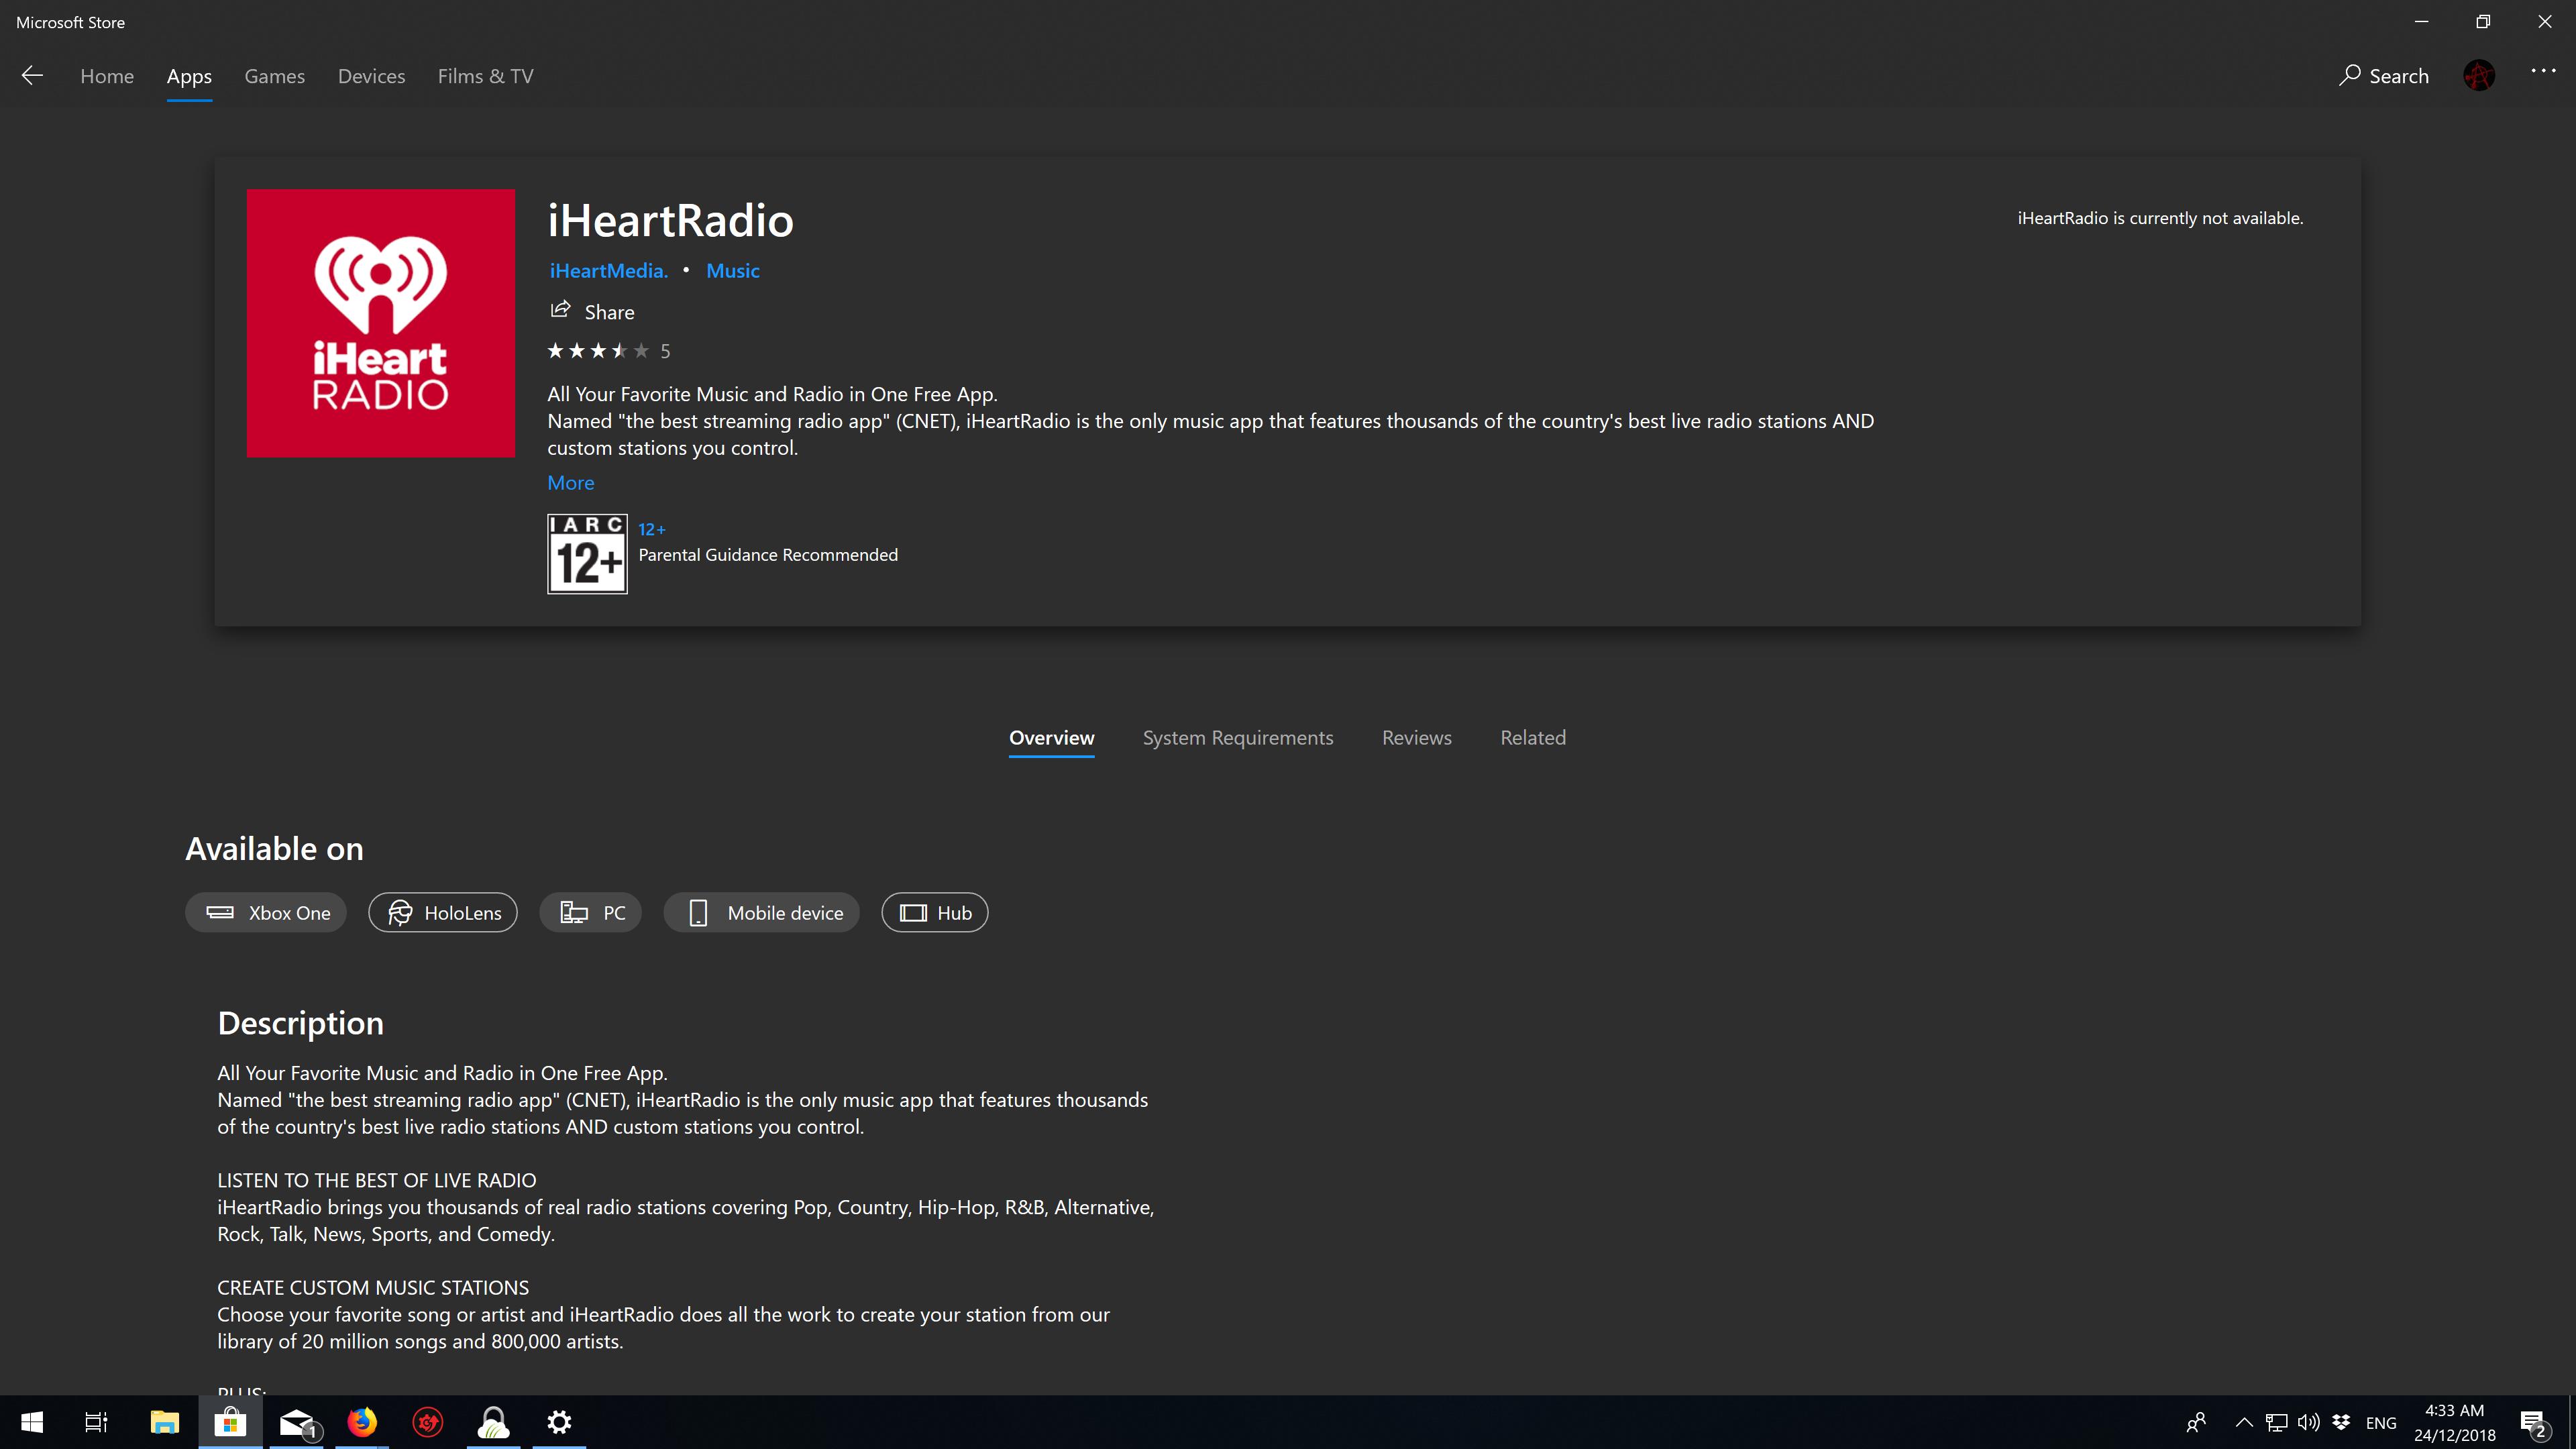 Cannot download iHeartRadio - Microsoft Community